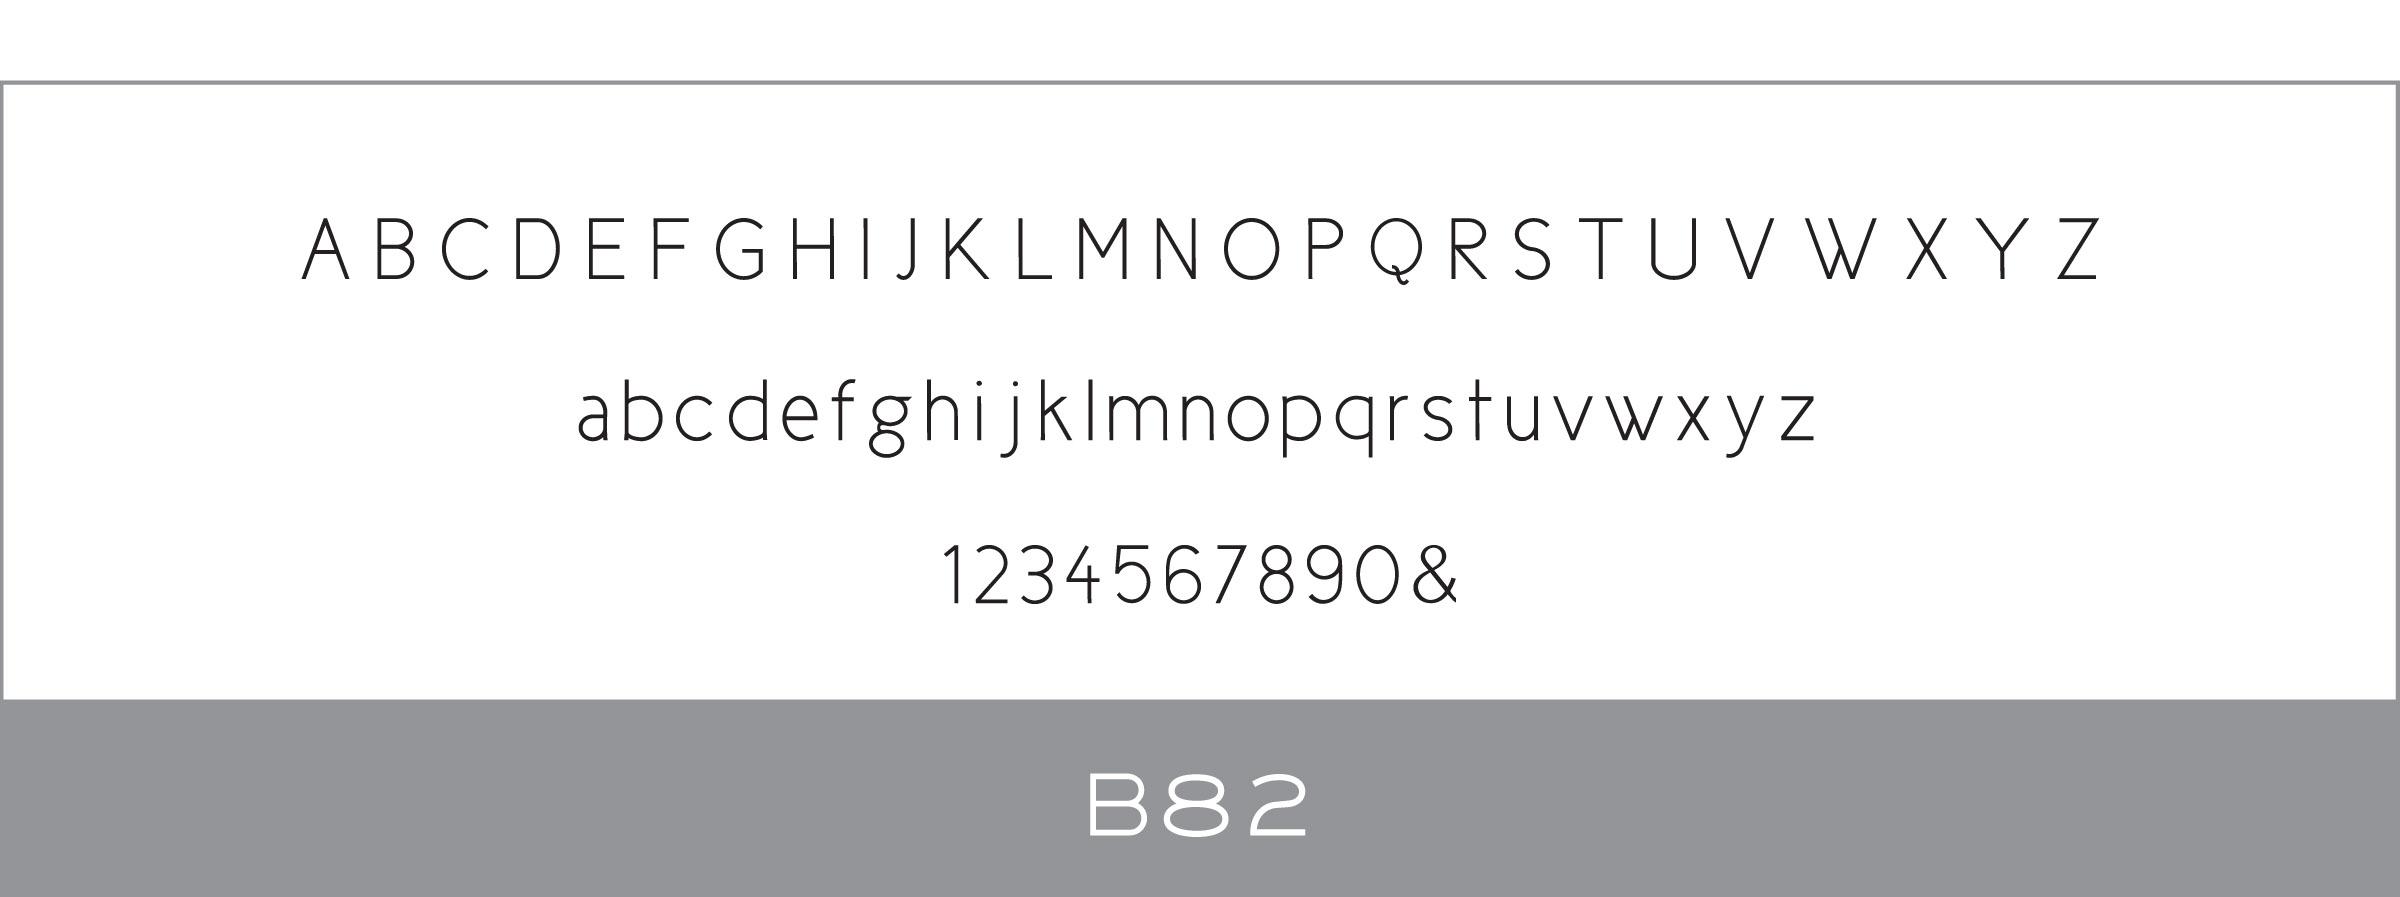 B82_Haute_Papier_Font.jpg